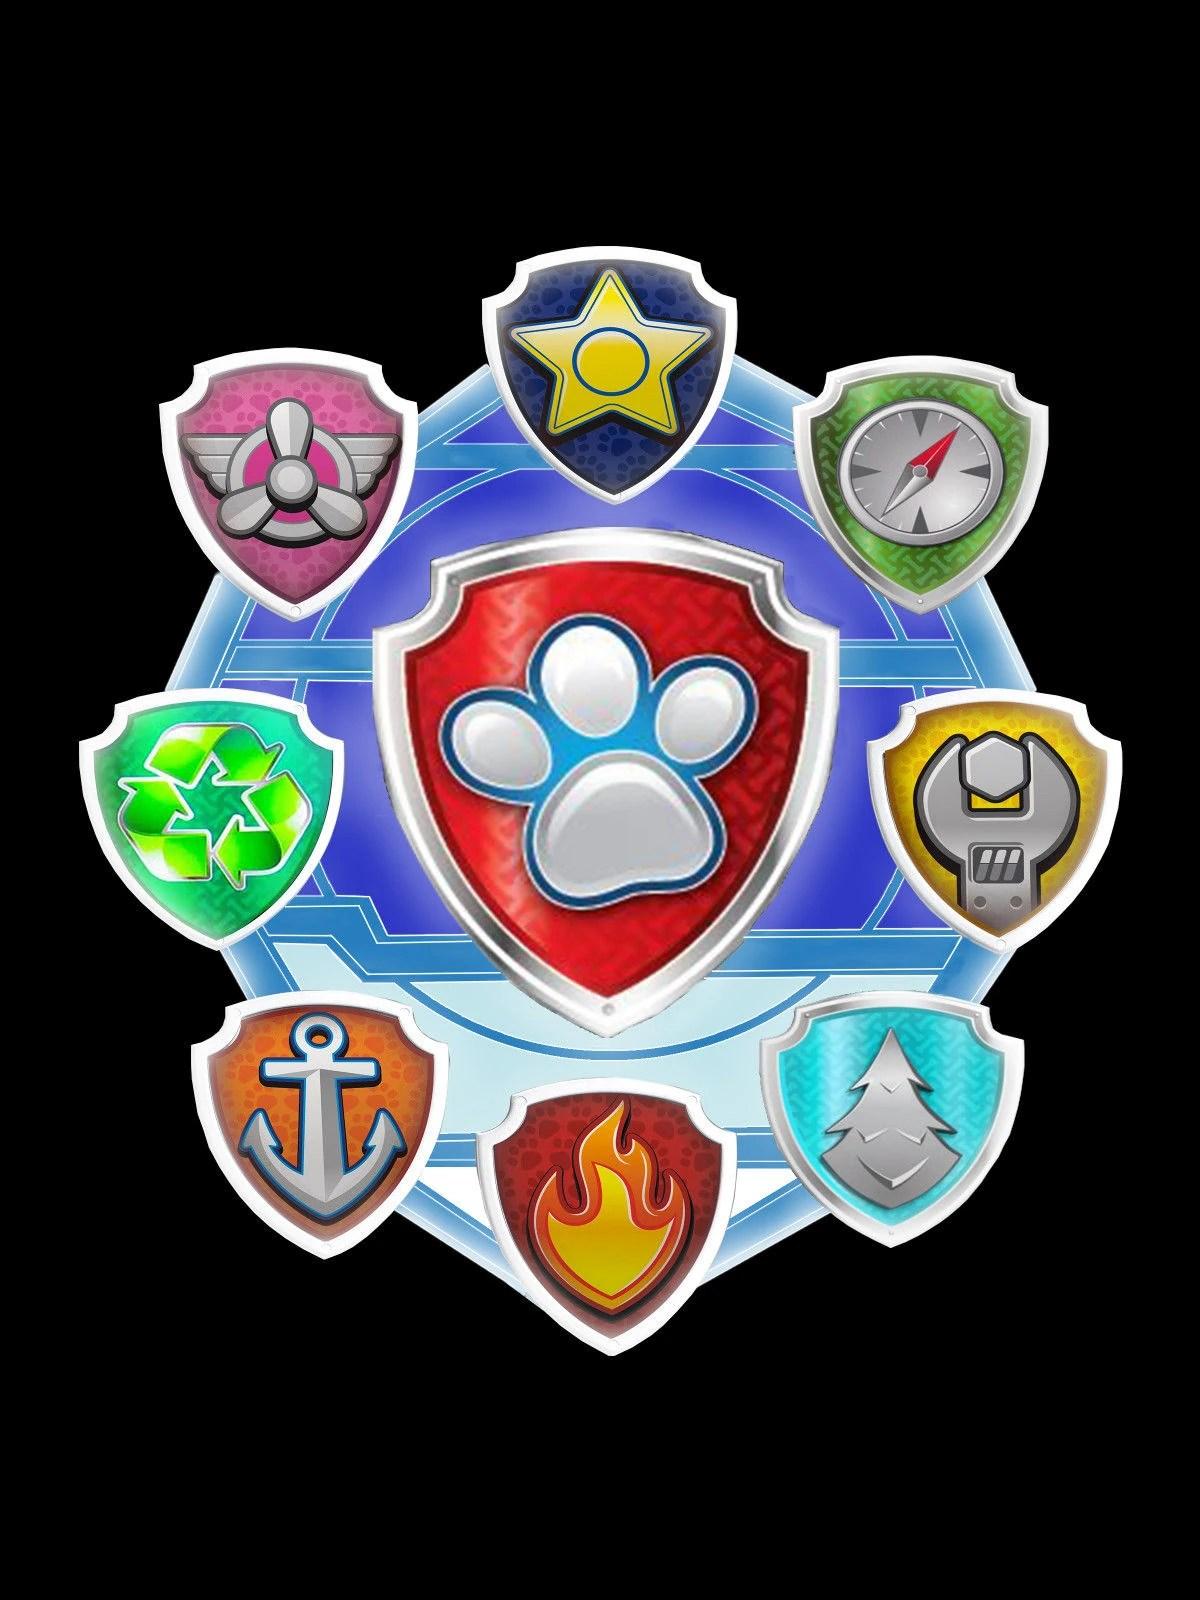 Paw Patrol Badge : patrol, badge, Badges, Adventures, Patrol, Fandom